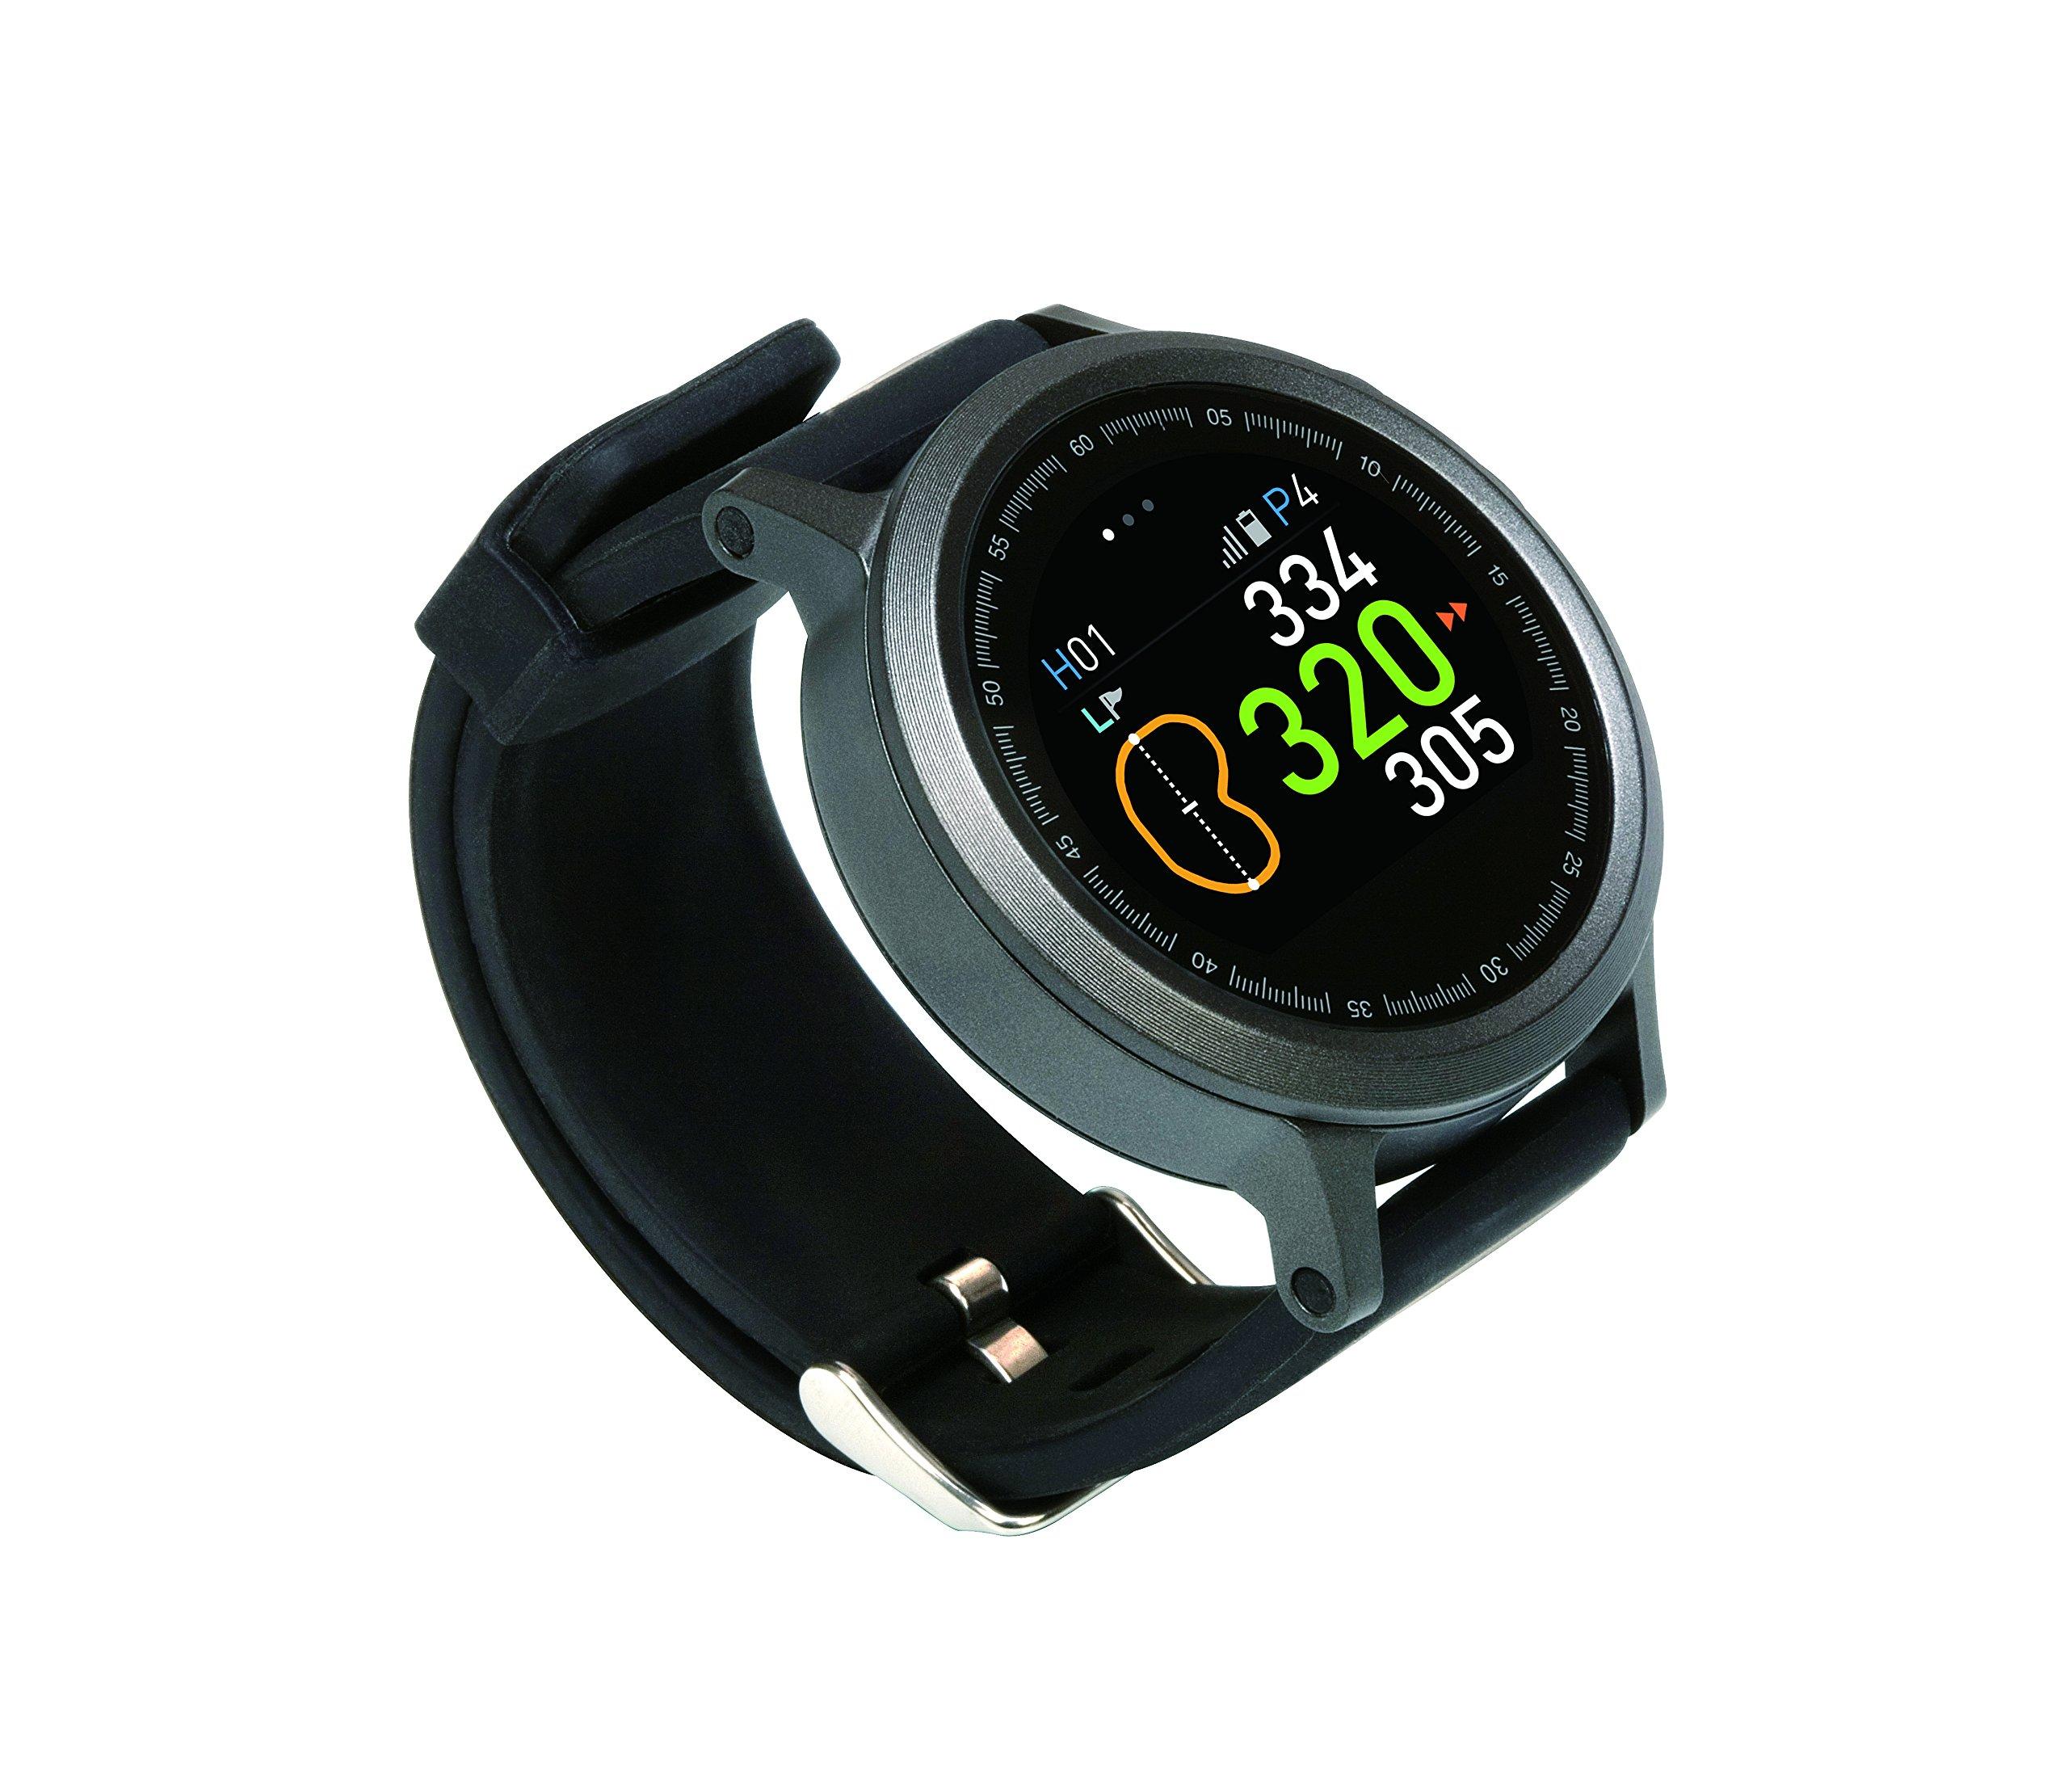 GolfBuddy WTX Smart Golf GPS Watch, Black by GolfBuddy (Image #5)